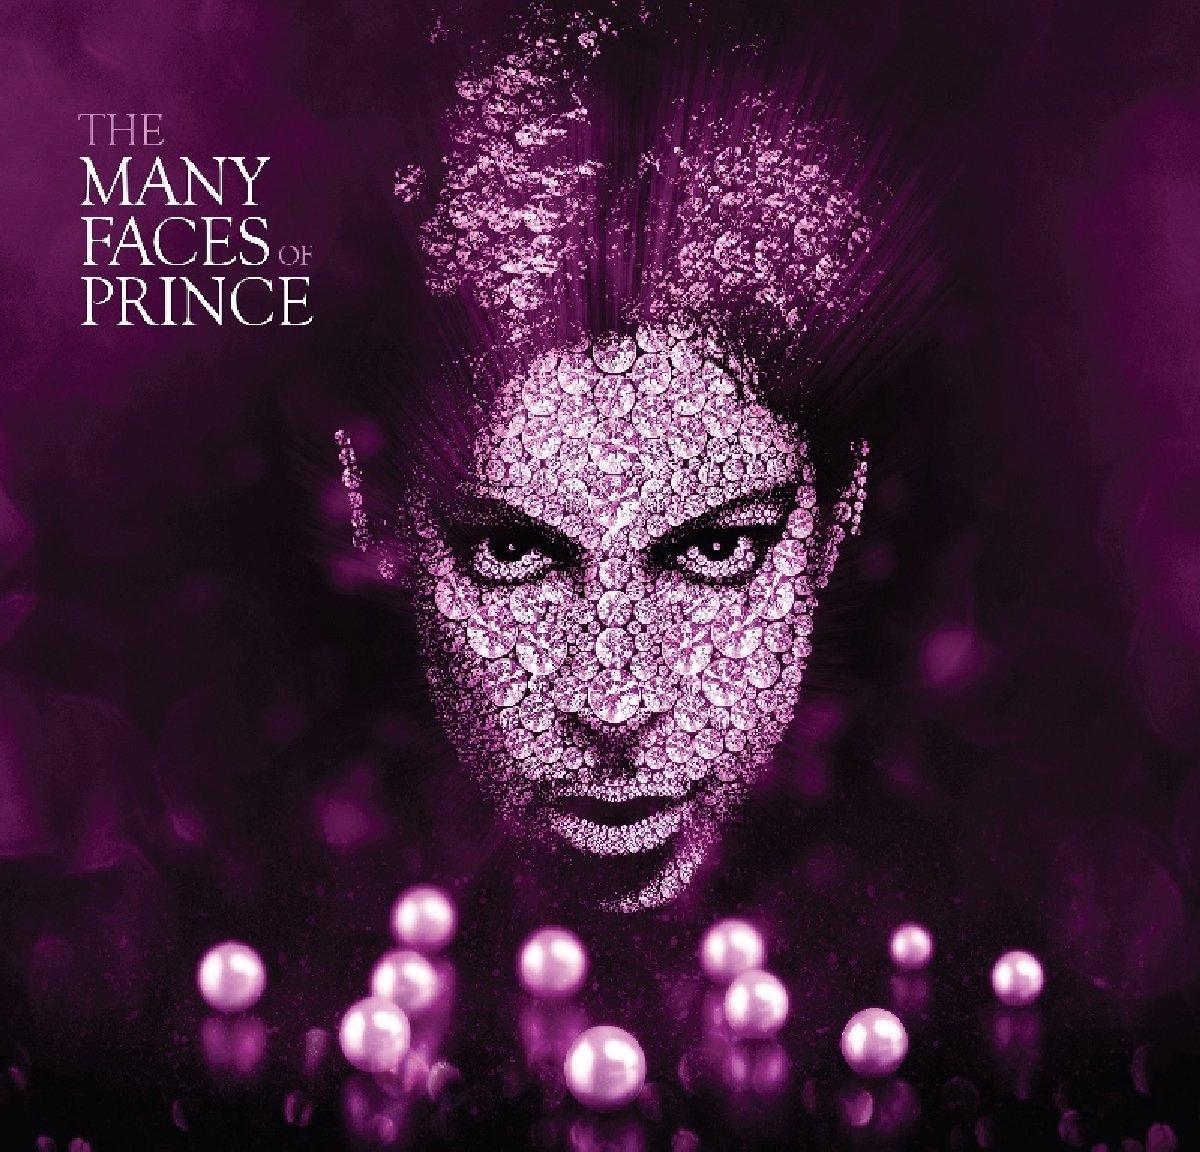 Many Faces of Prince / PRINCEのジャケット